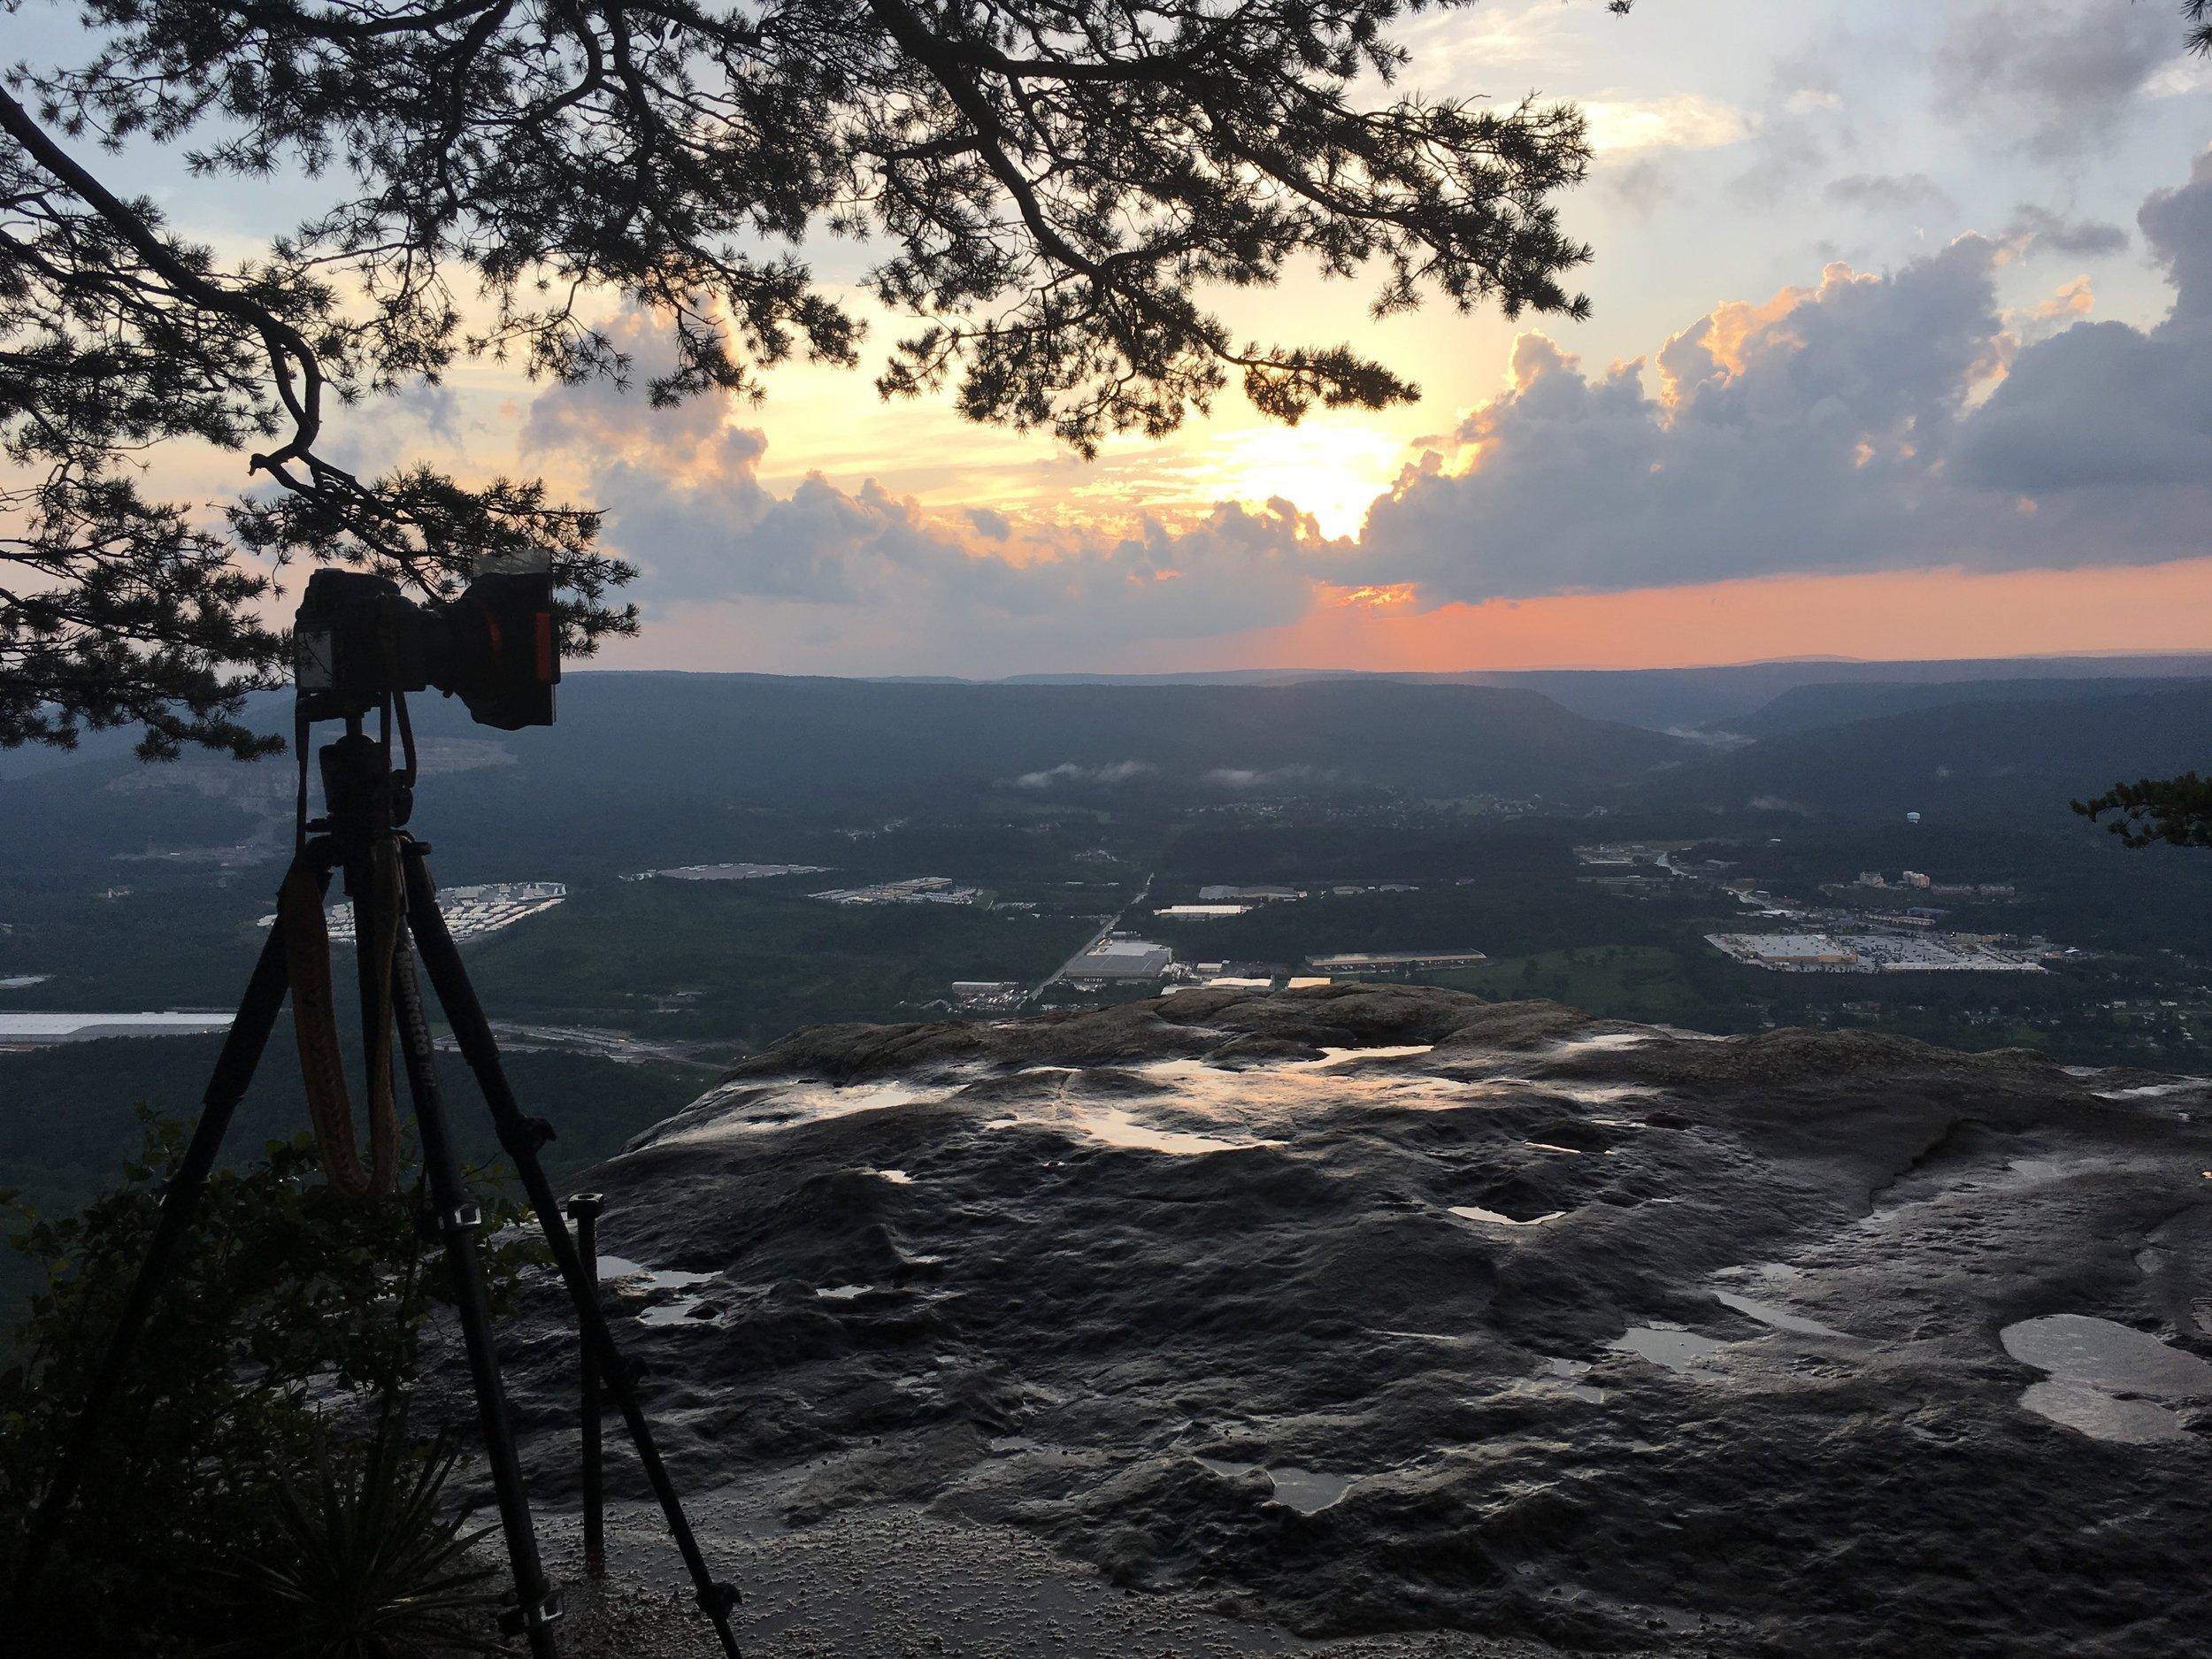 adv 1 sunset rock 5.jpg